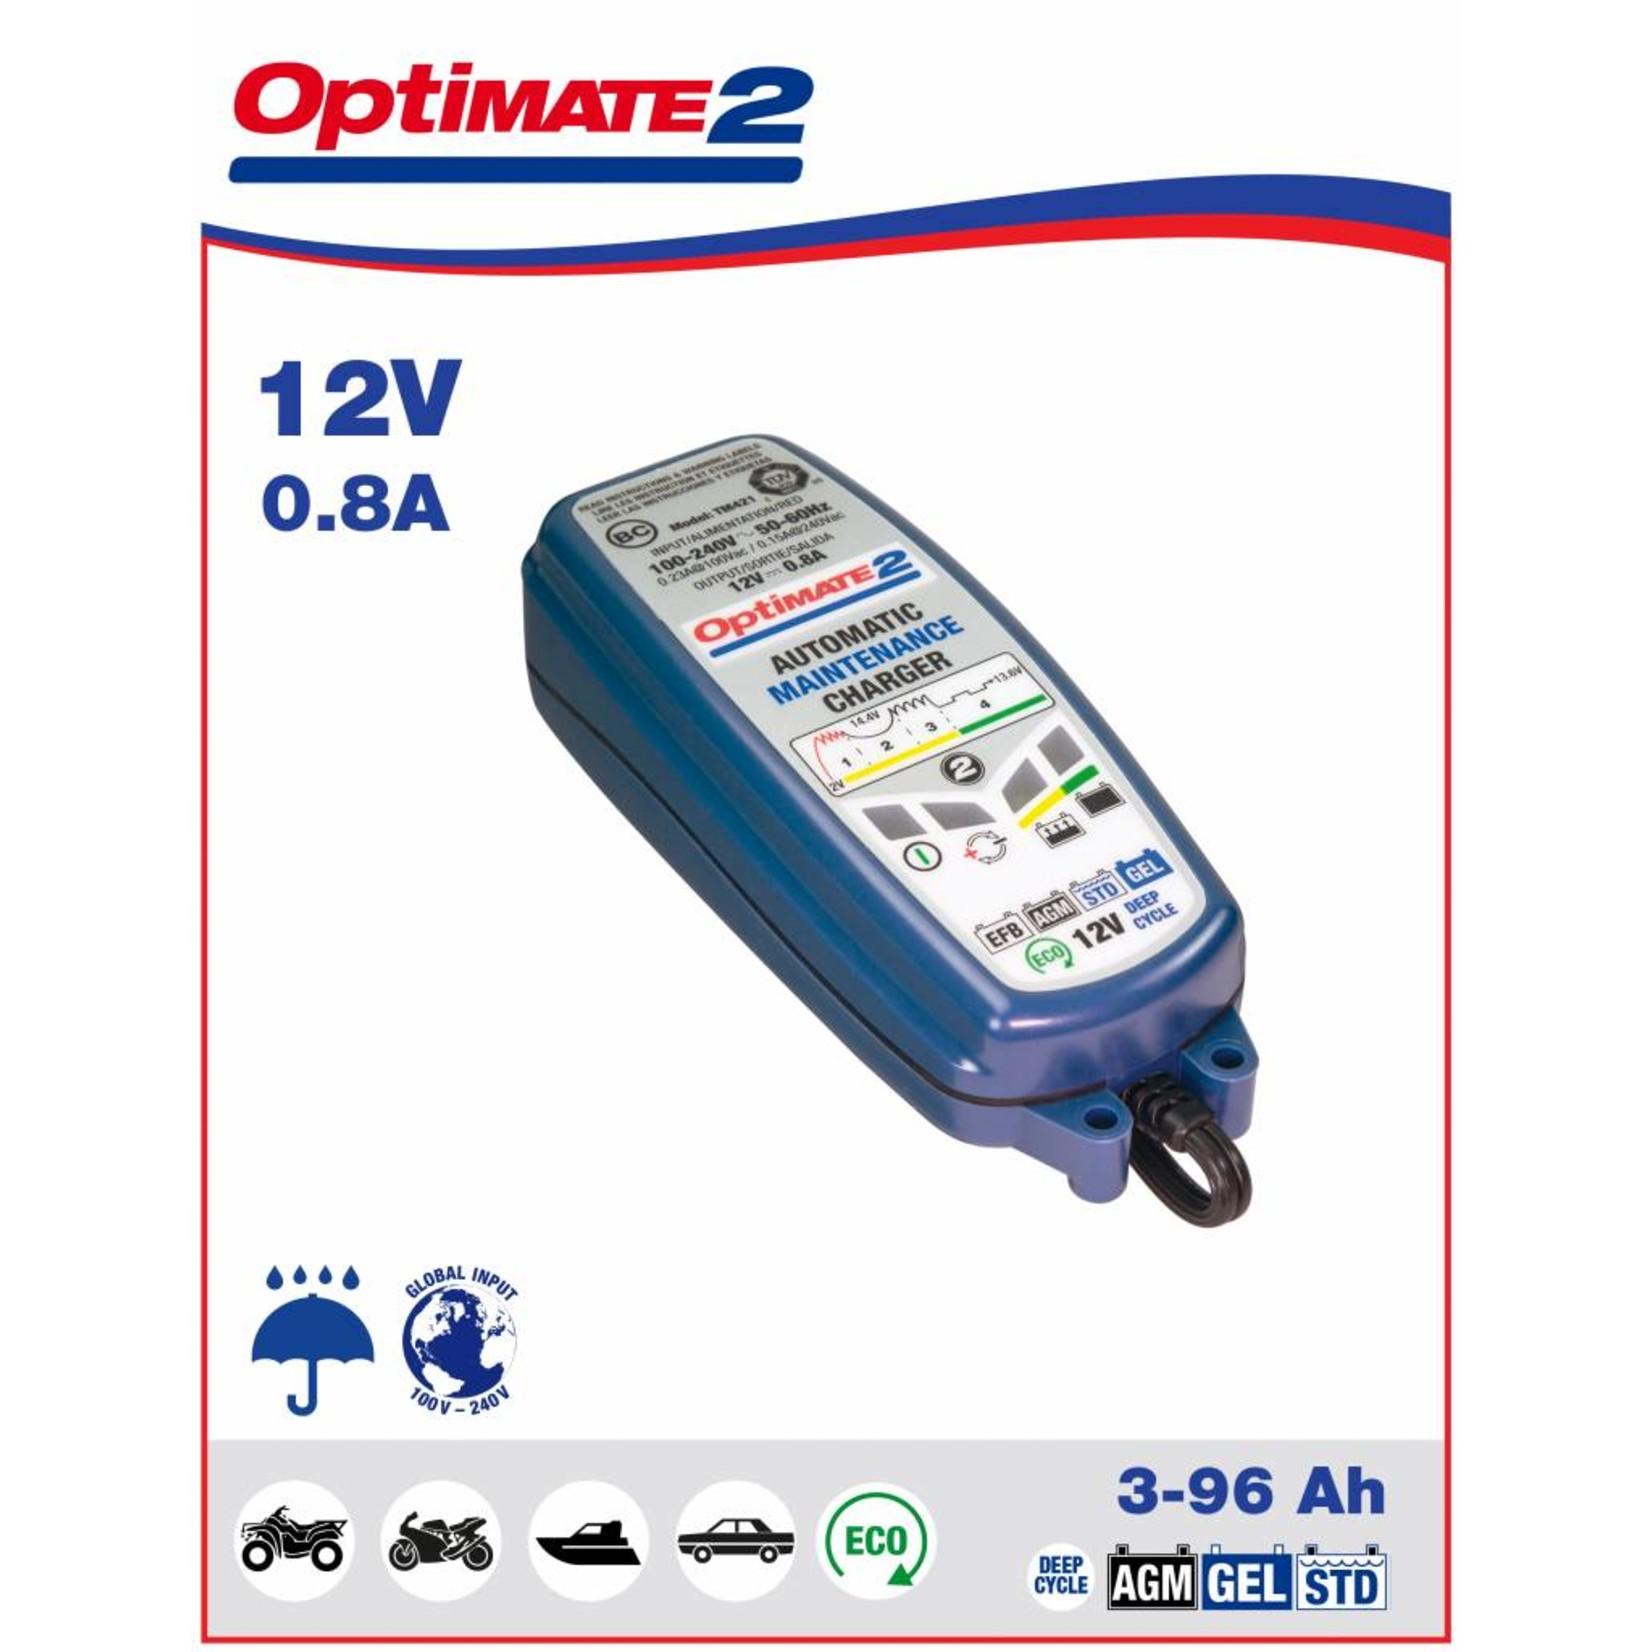 OptiMate OptiMate 2  - Acculader 12V